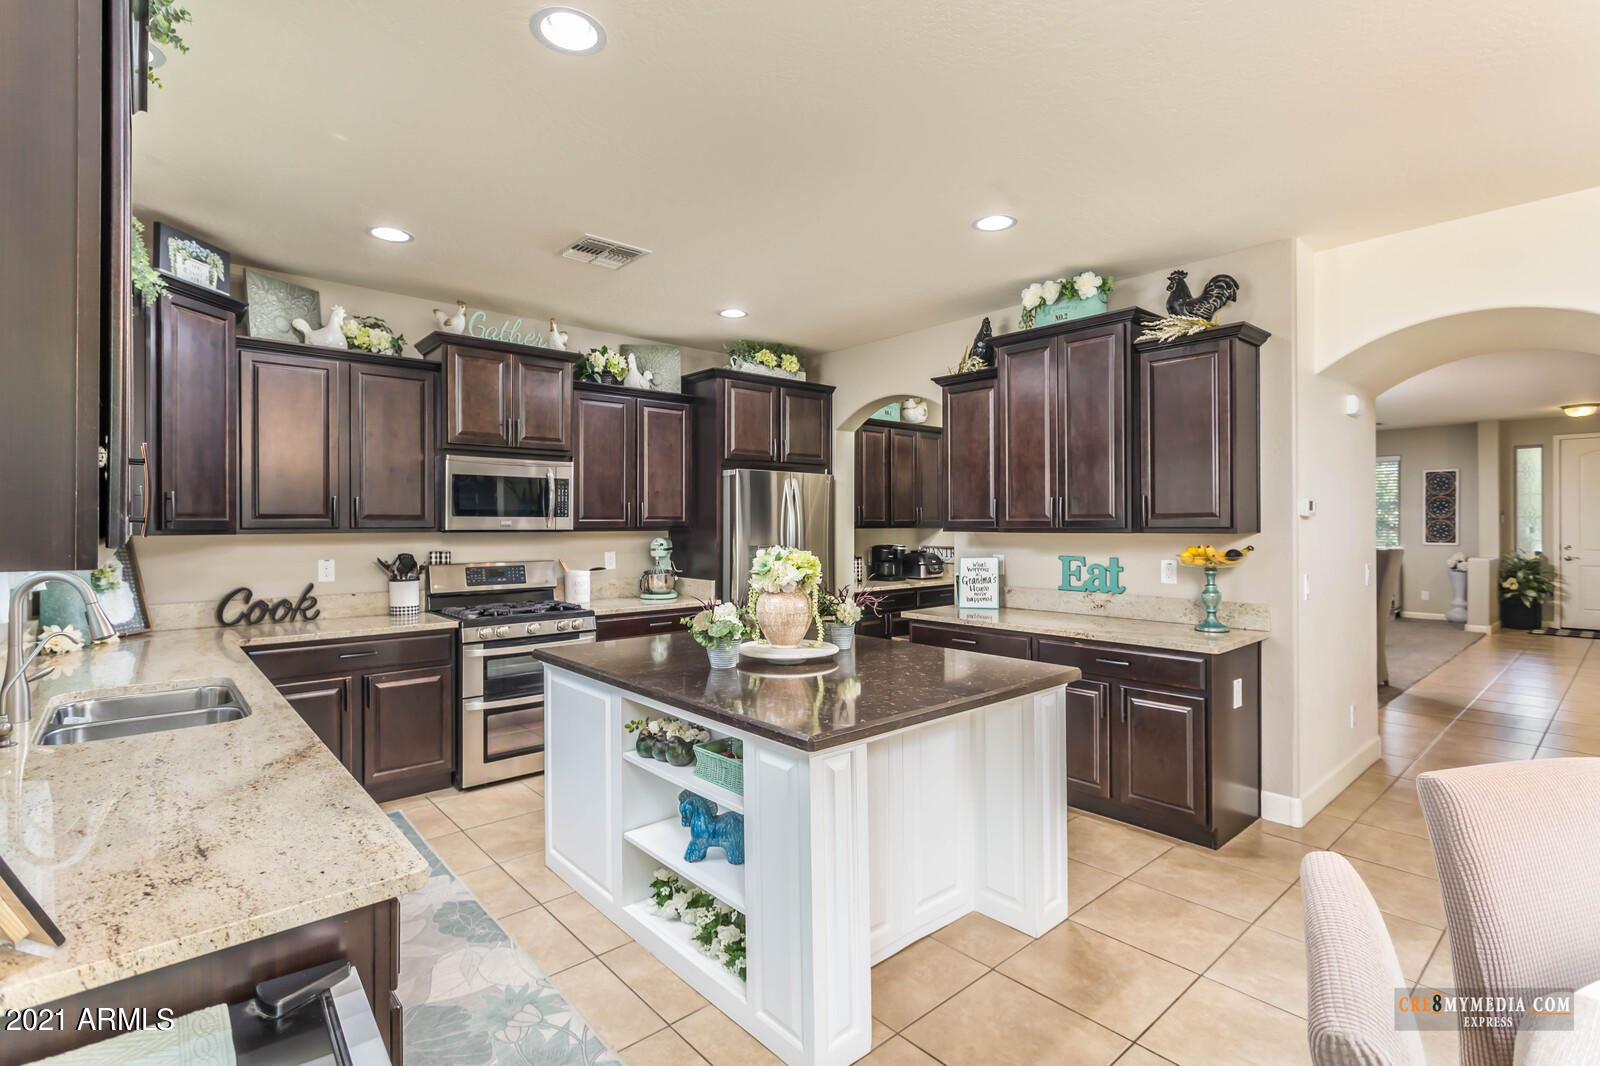 Photo for 40159 W COLTIN Way, Maricopa, AZ 85138 (MLS # 6246041)